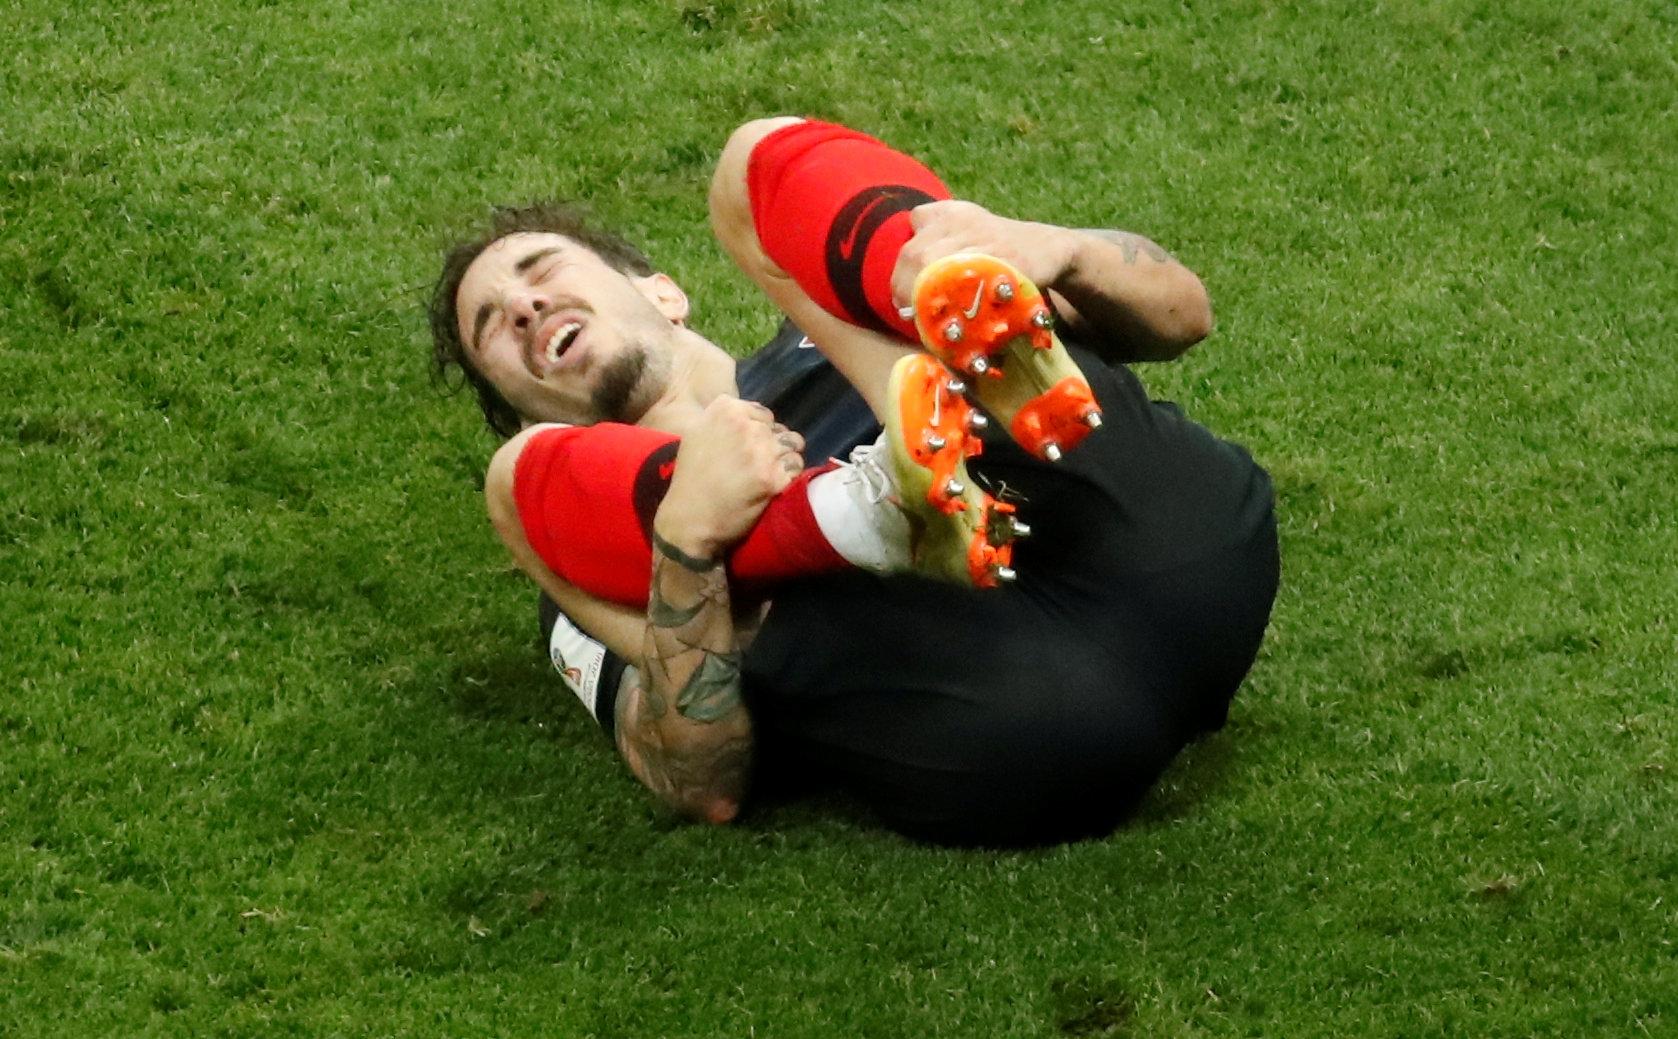 Soccer Football - World Cup - Semi Final - Croatia v England - Luzhniki Stadium, Moscow, Russia - July 11, 2018  Croatia's Sime Vrsaljko reacts as he holds his leg                                       REUTERS/Christian Hartmann